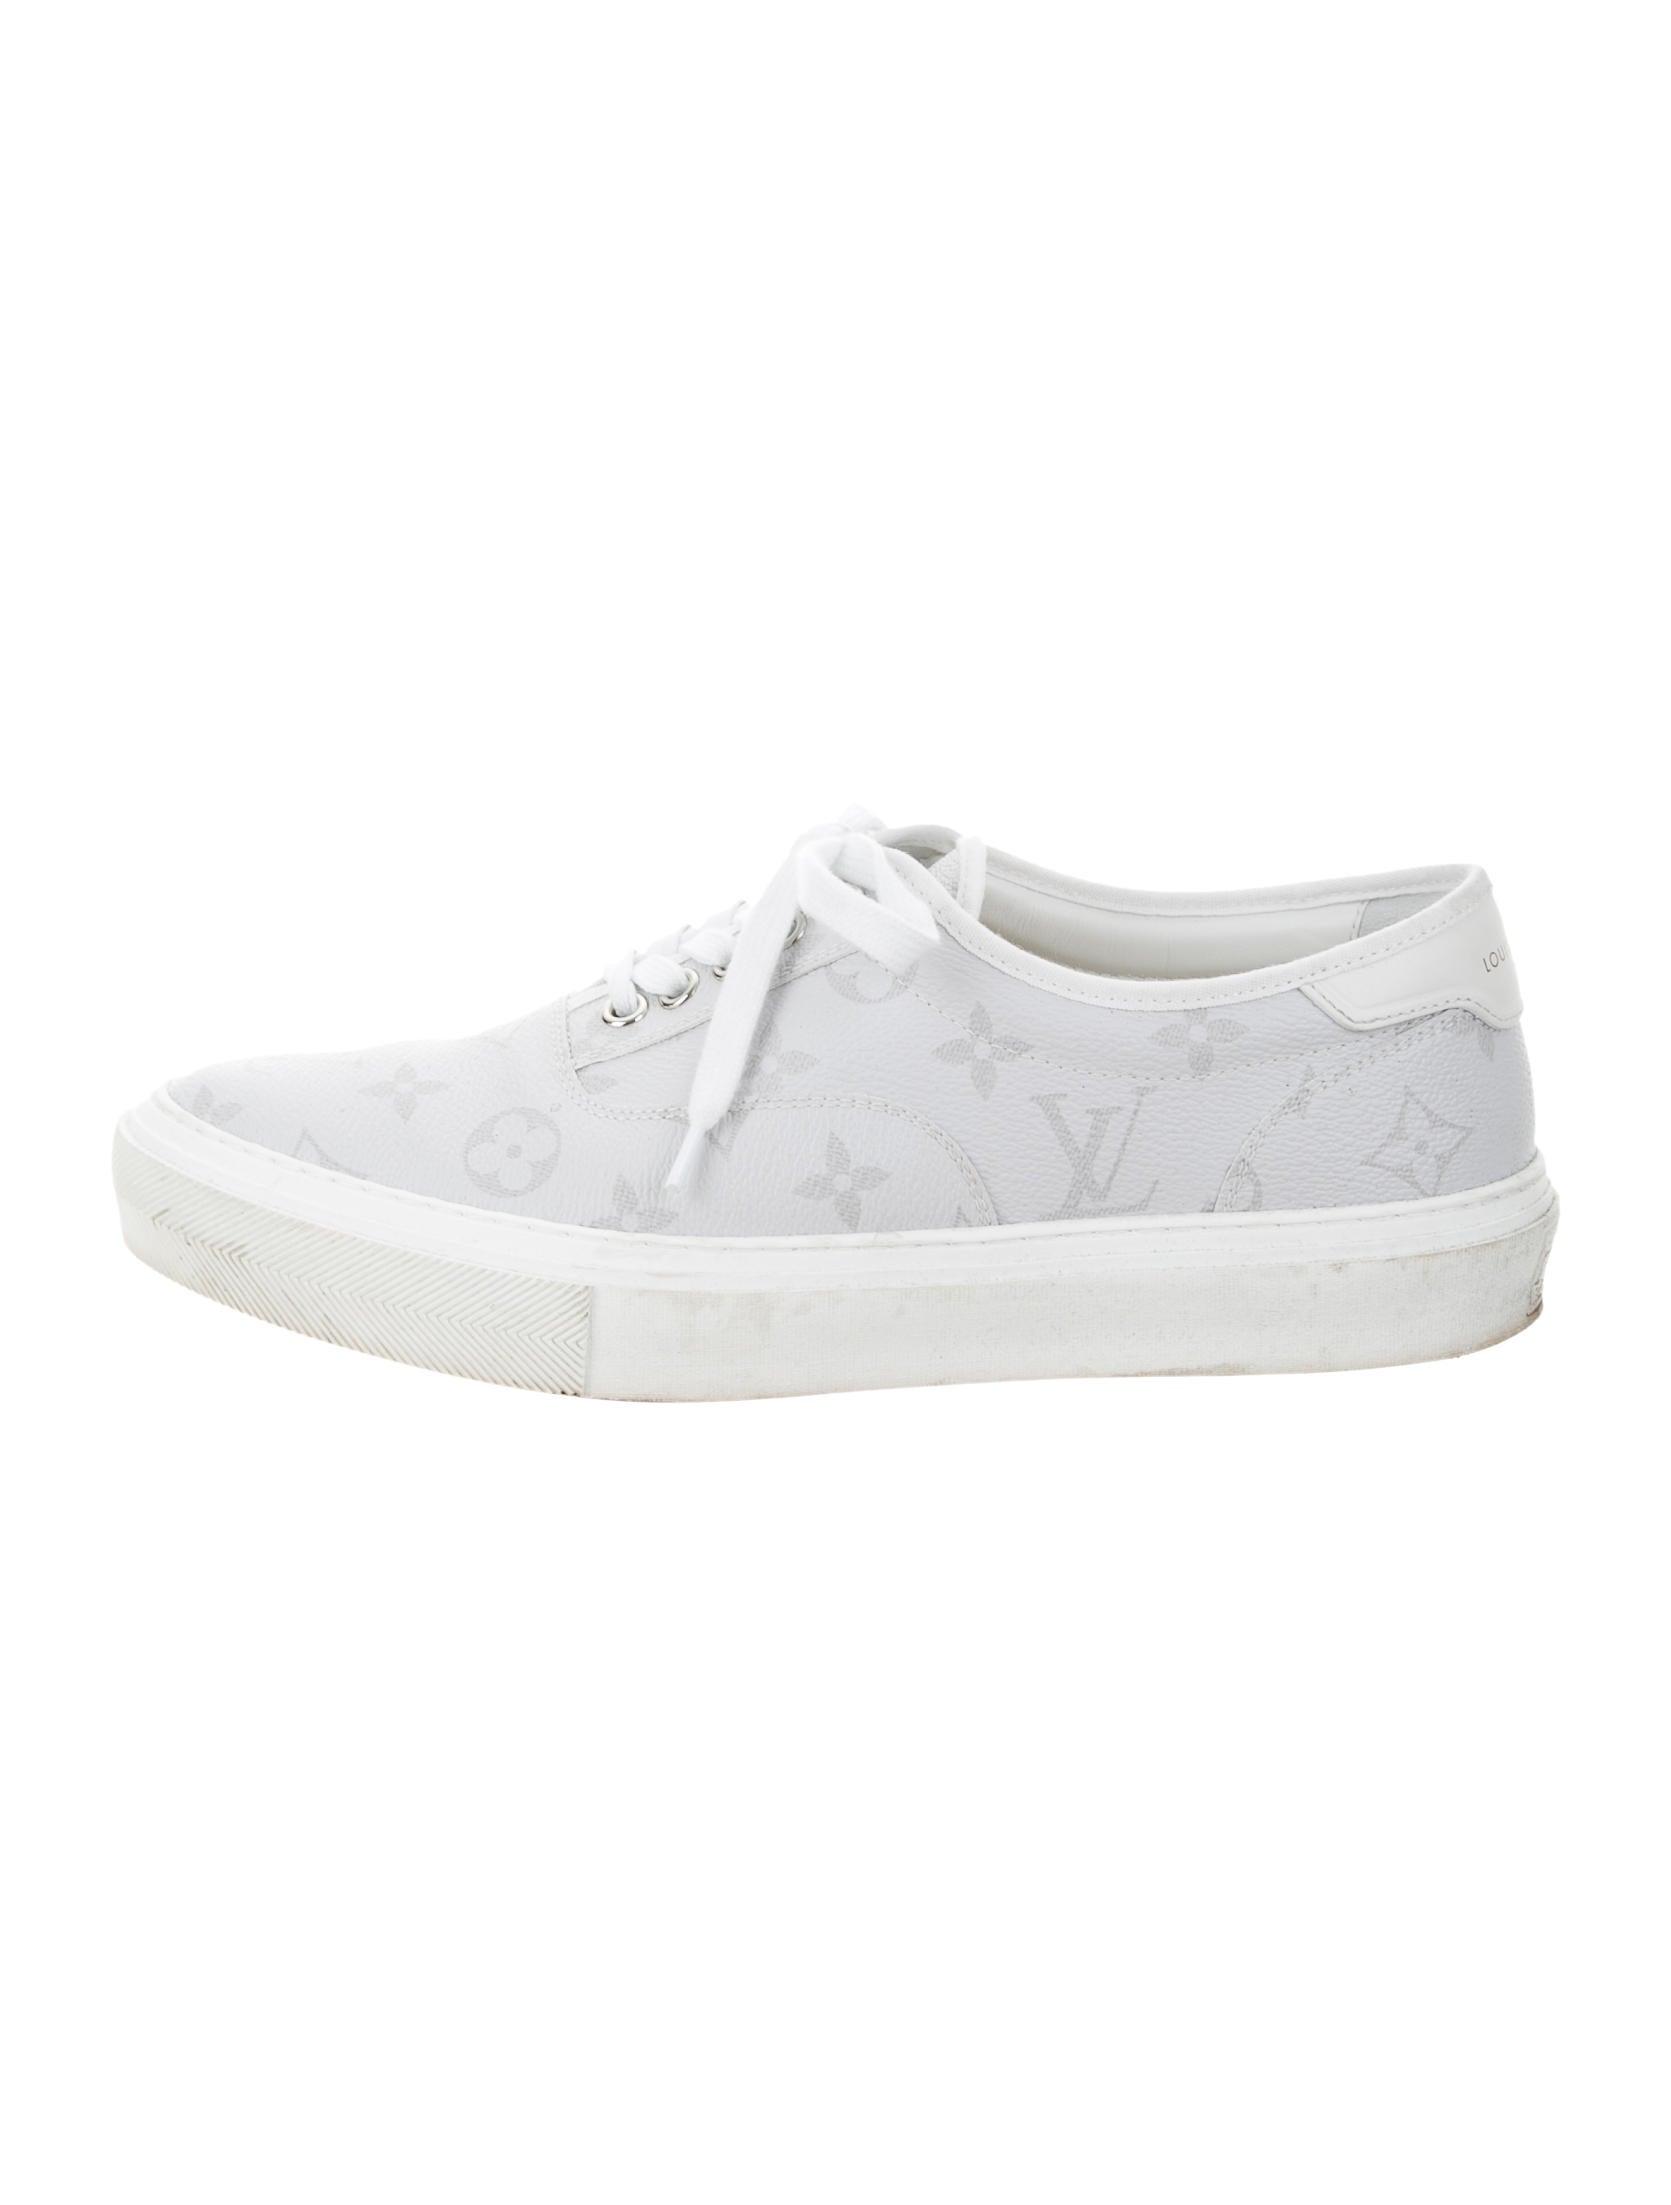 Louis Vuitton 2016 Trocadero Monogram Sneakers - Shoes - LOU112798 ... b4e57ab0666